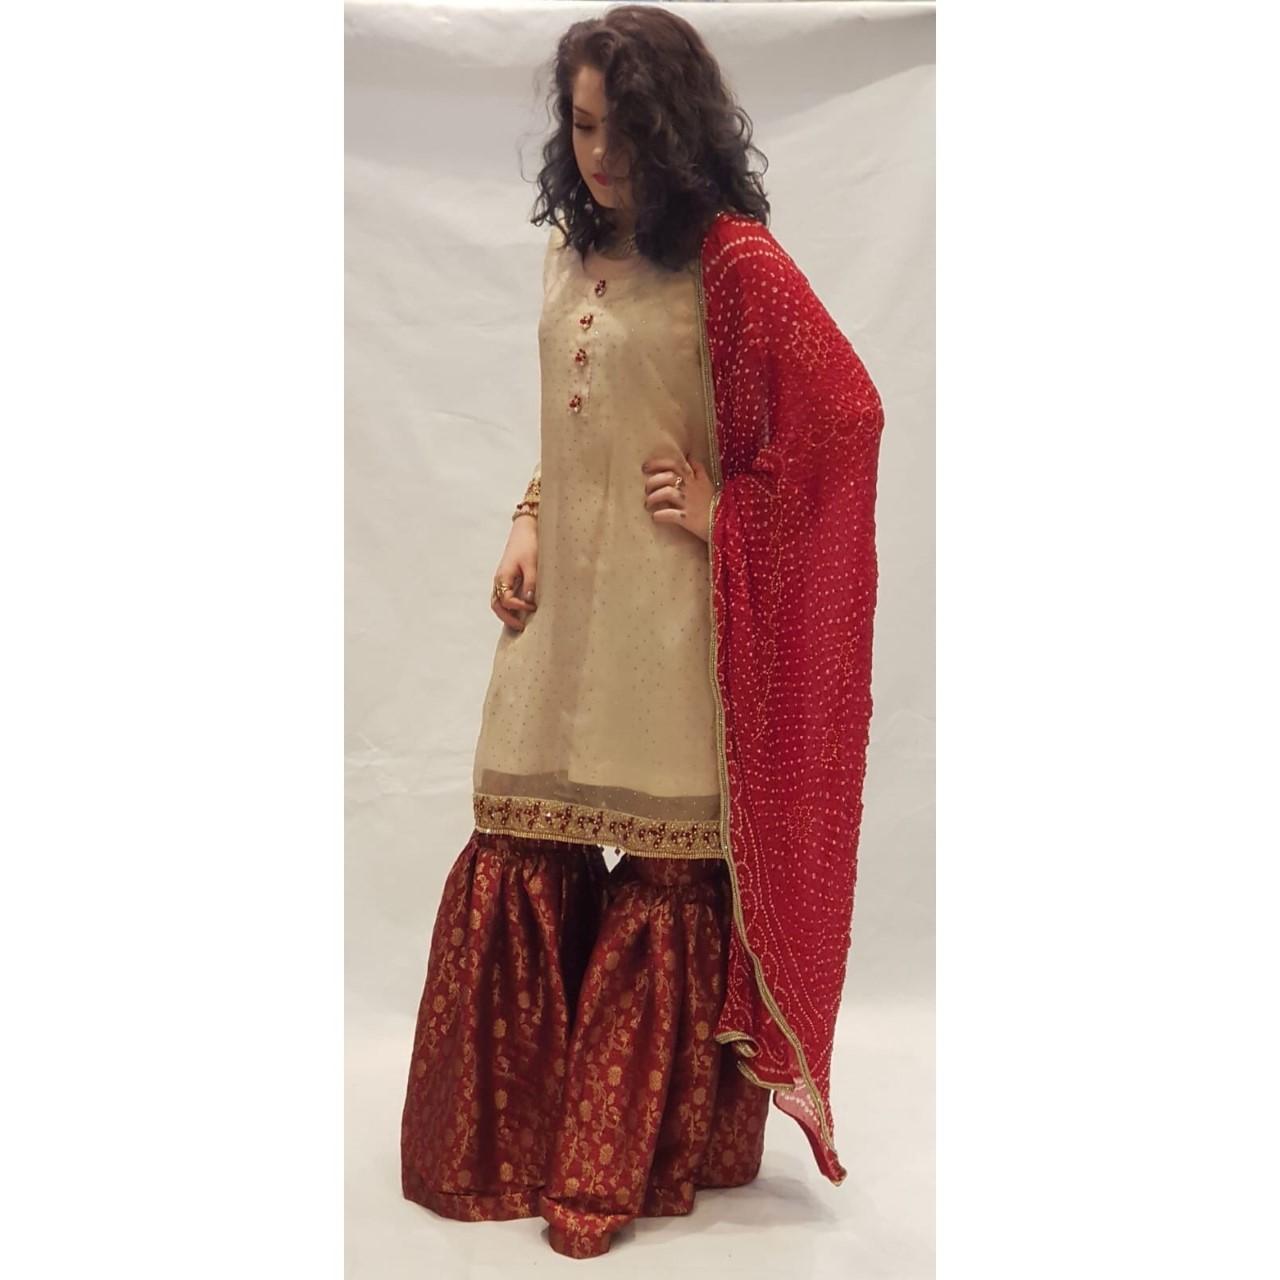 89b7dcb8e5 Red & Beige Dress - Sarah Zaaraz London Fashion Designer   Pakistani Dress  Designer   Bridal Dresses